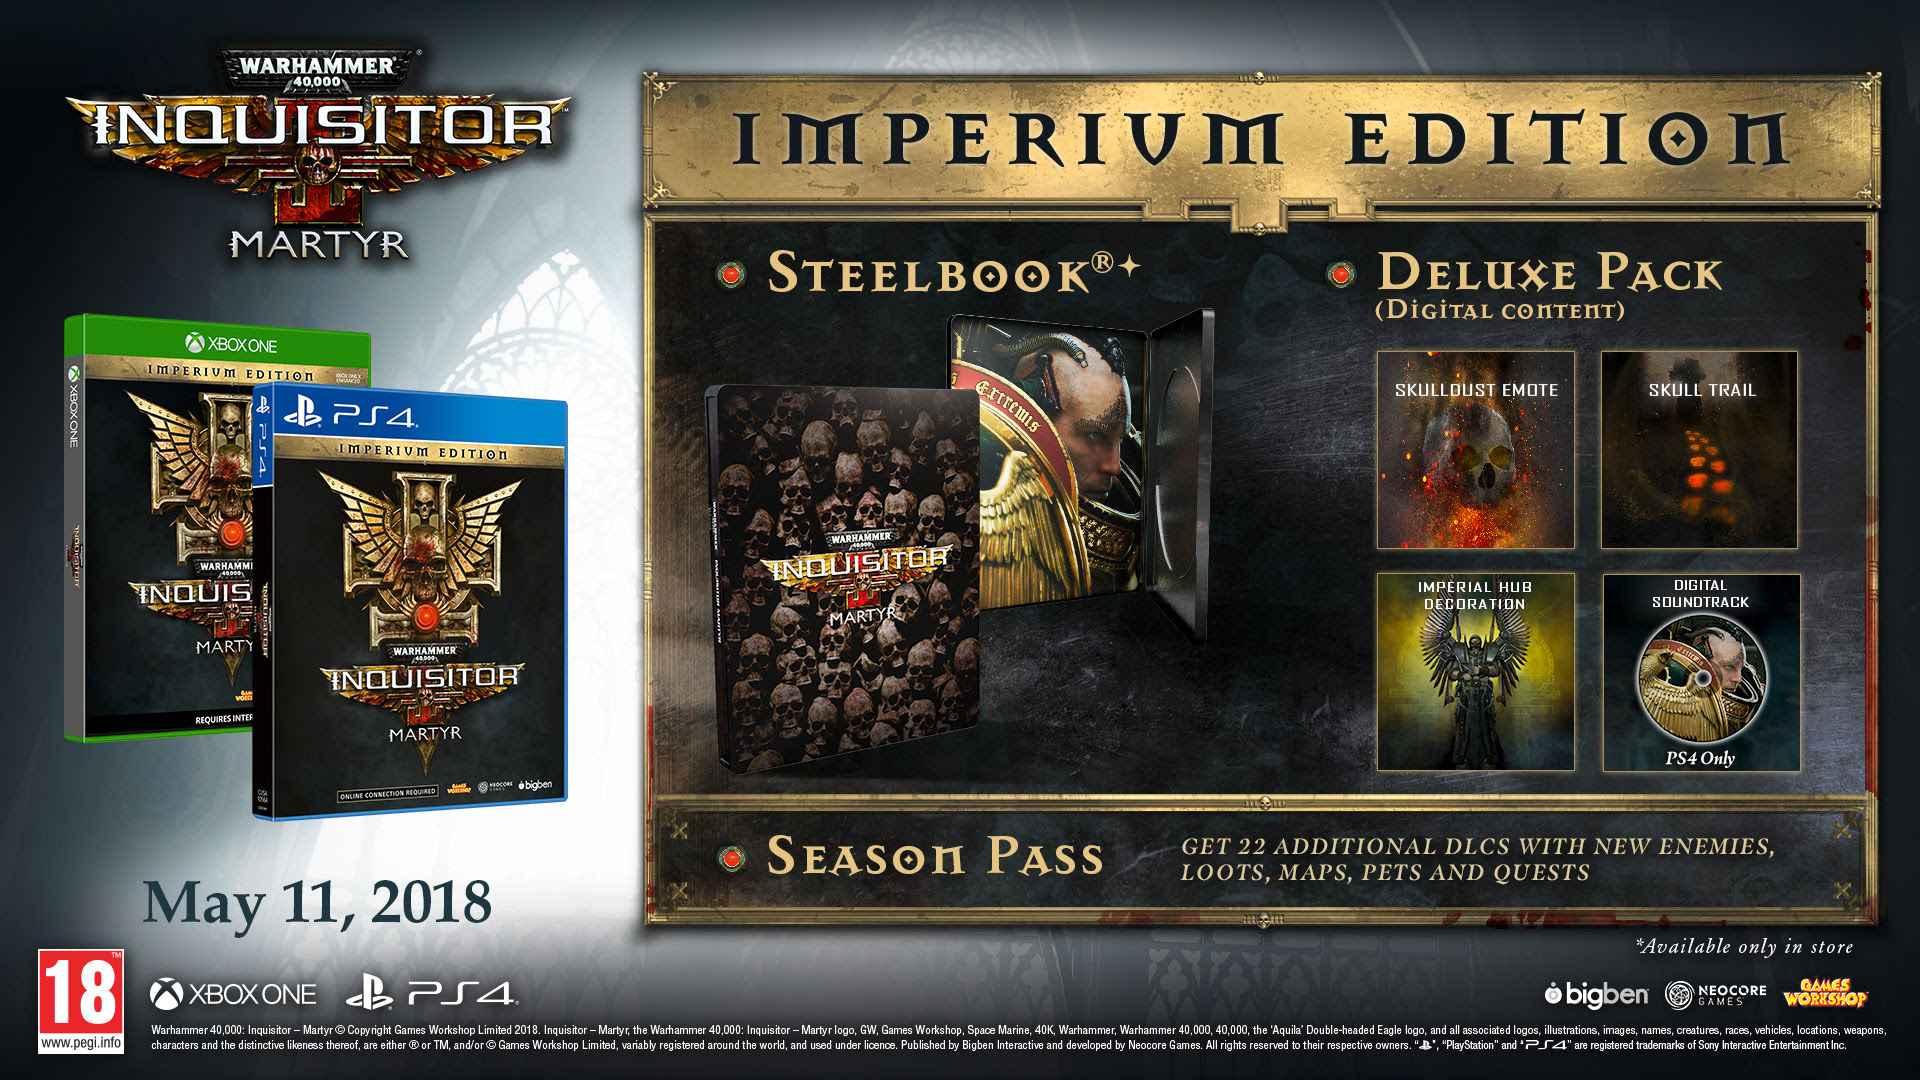 warhammer 40k special edition